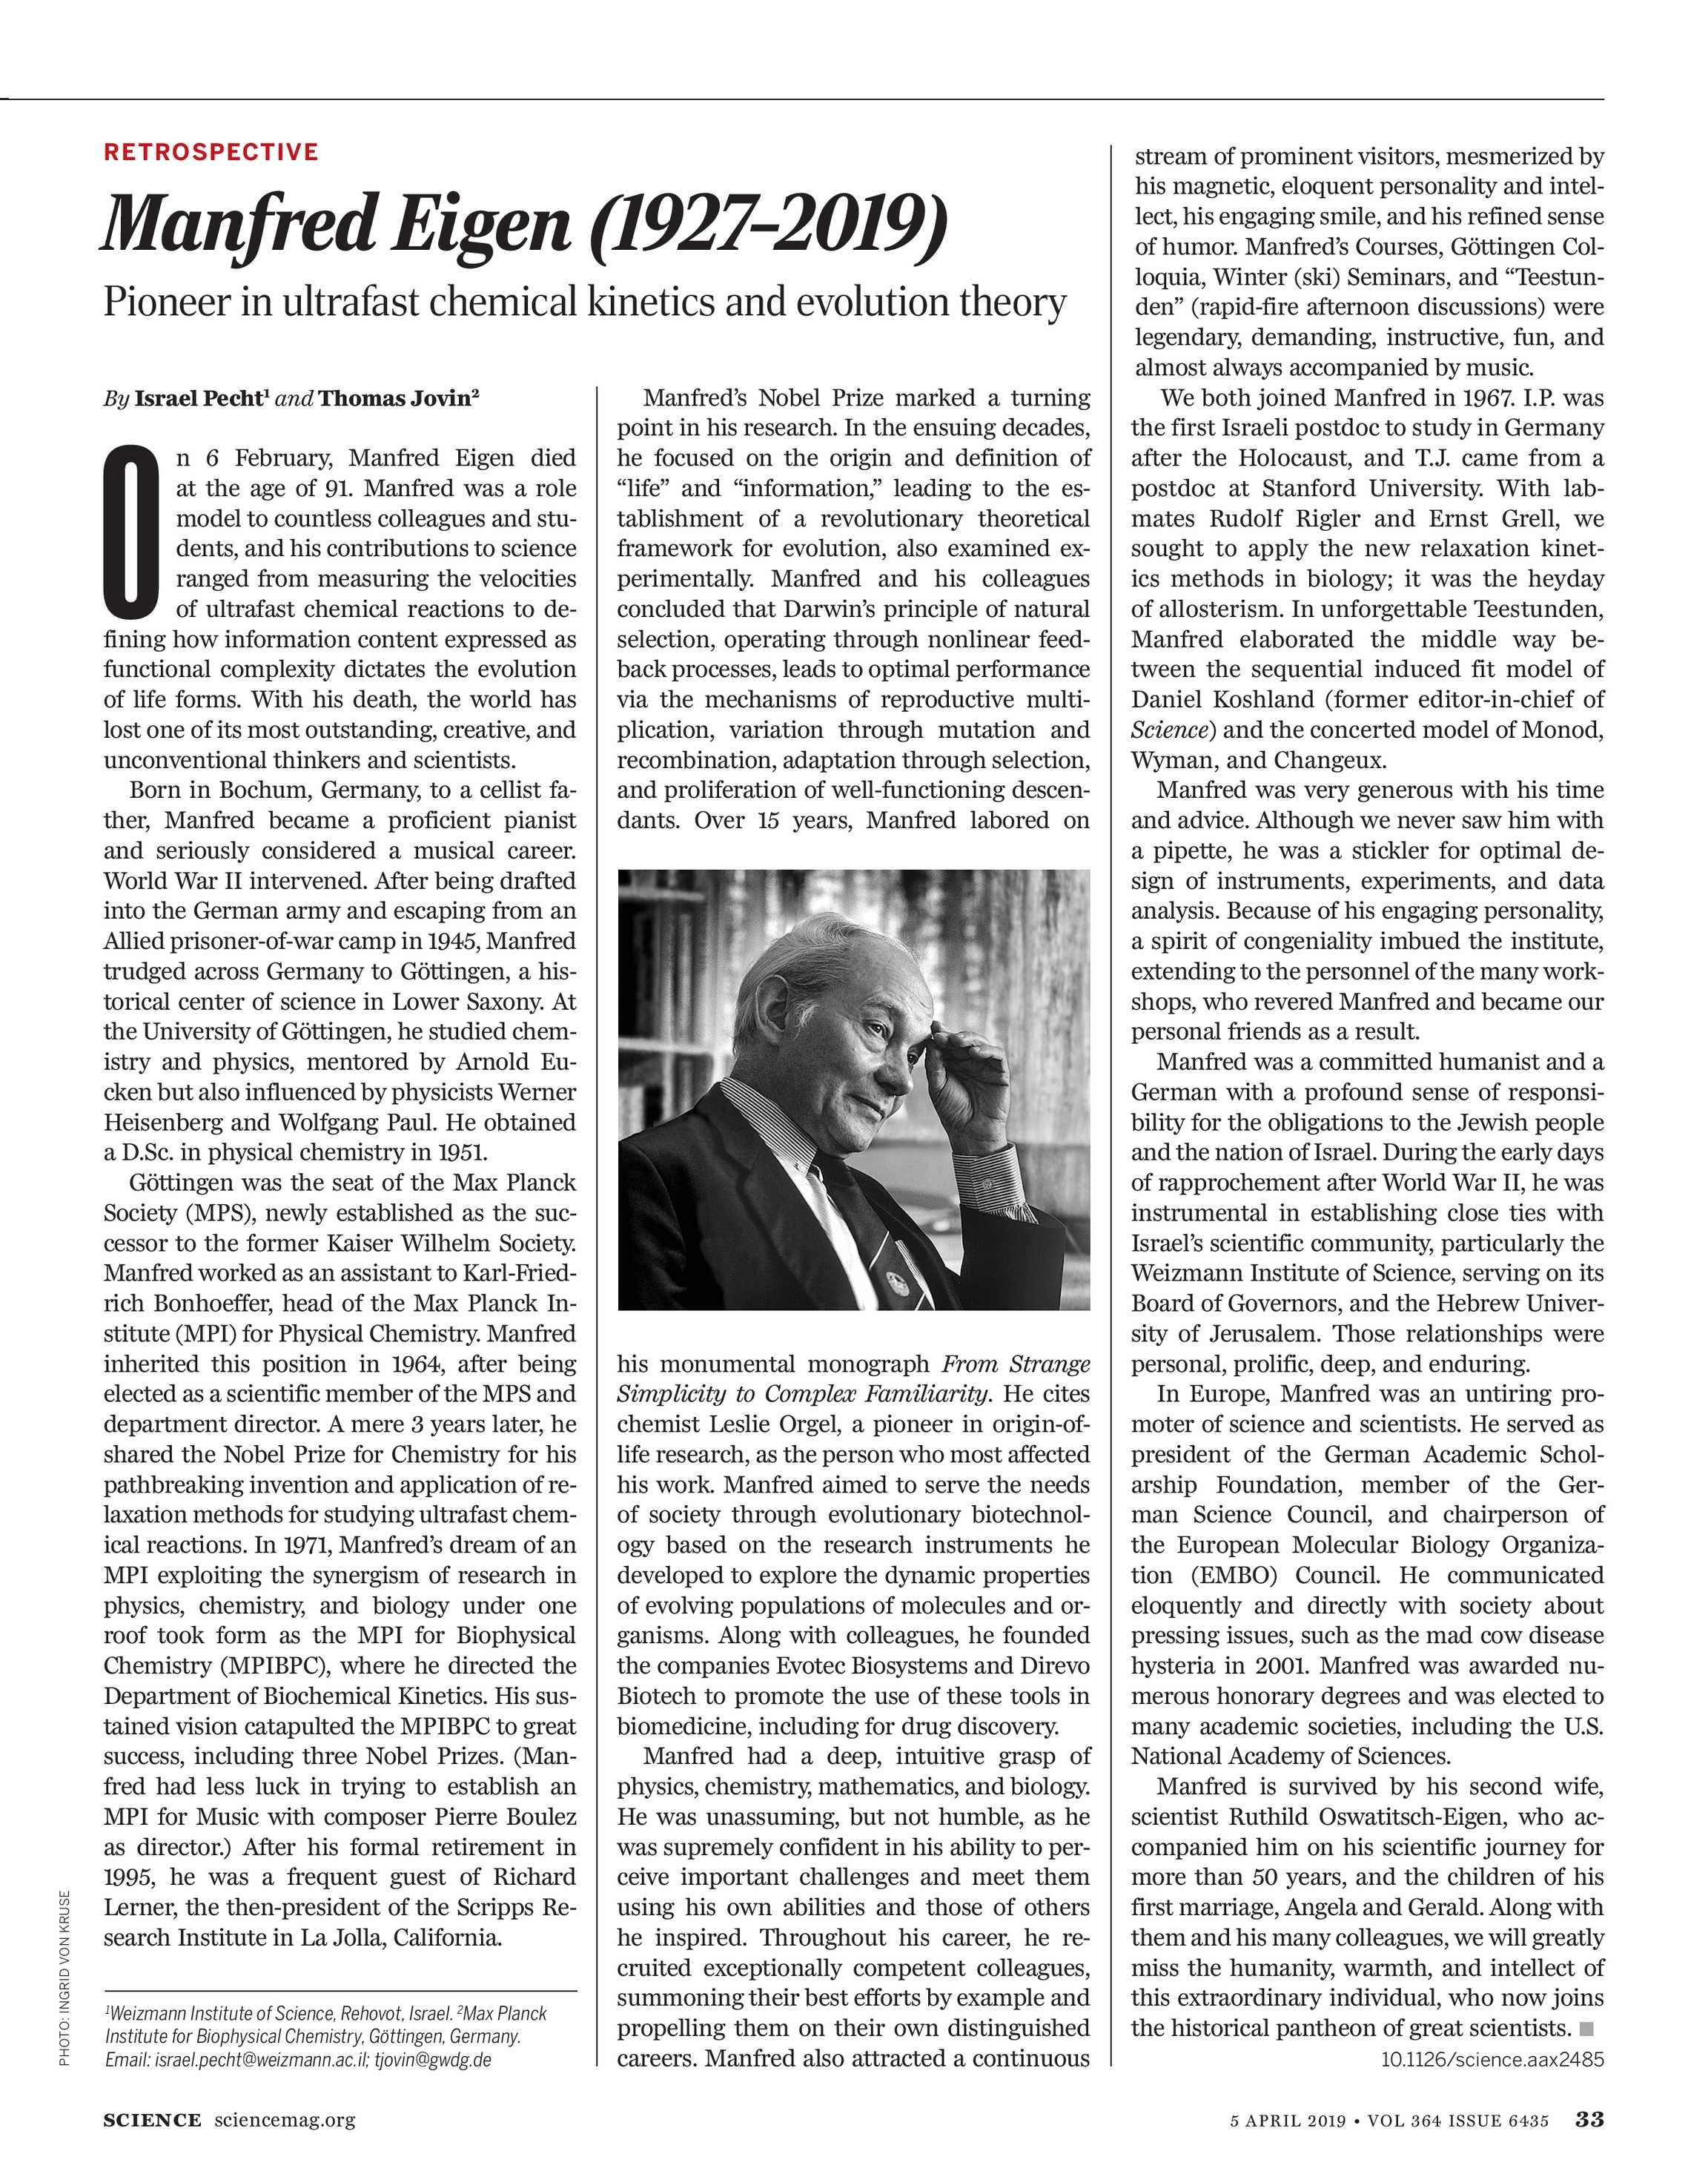 Science Magazine - April 5, 2019 - page 33